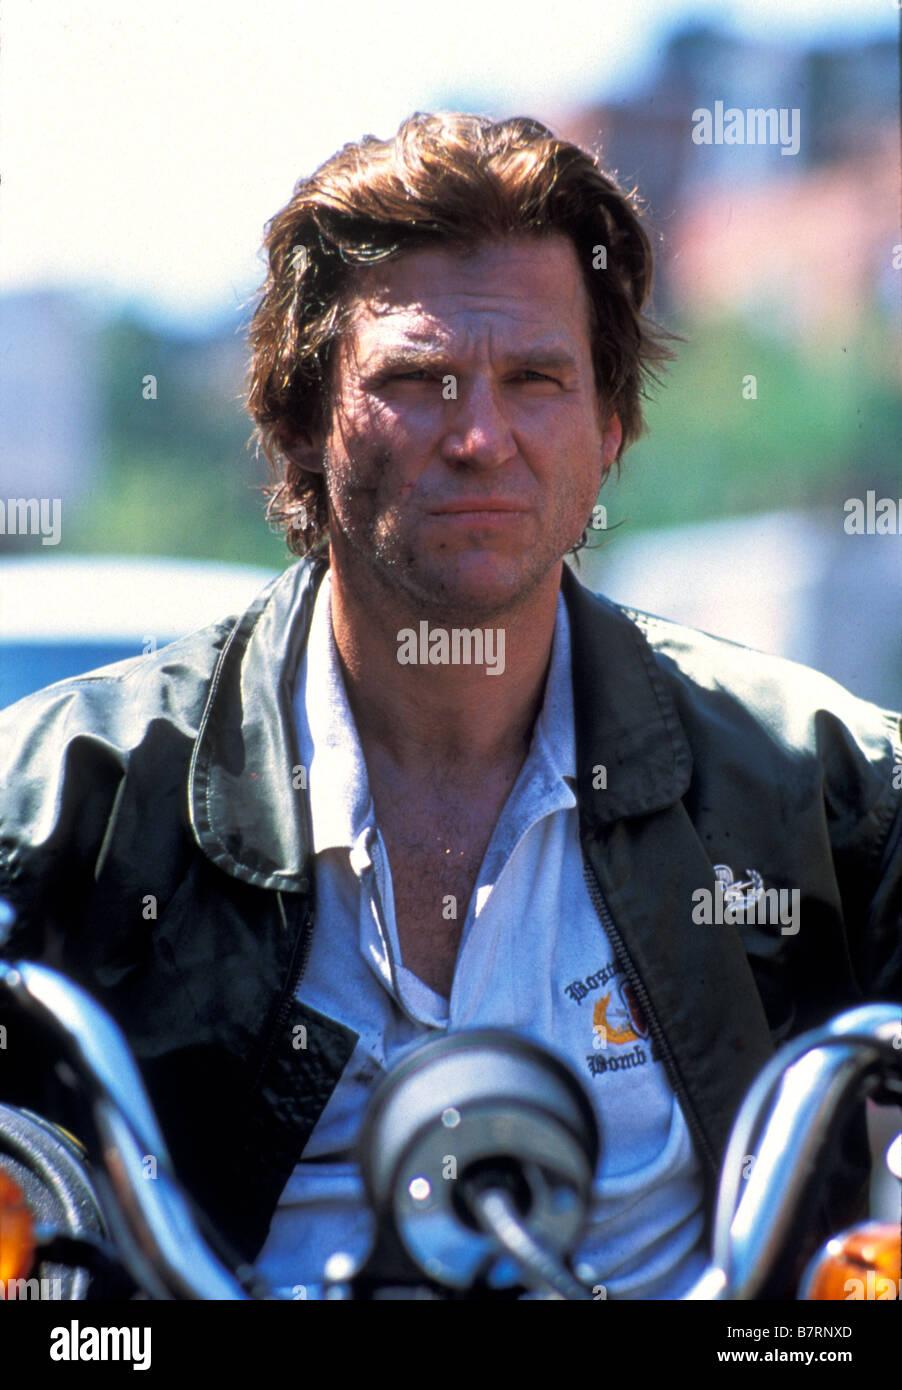 Blown away BLOWN AWAY Année 1994 usa Jeff Bridges USA 1994 Réalisateur Stephen Hopkins Stock Photo